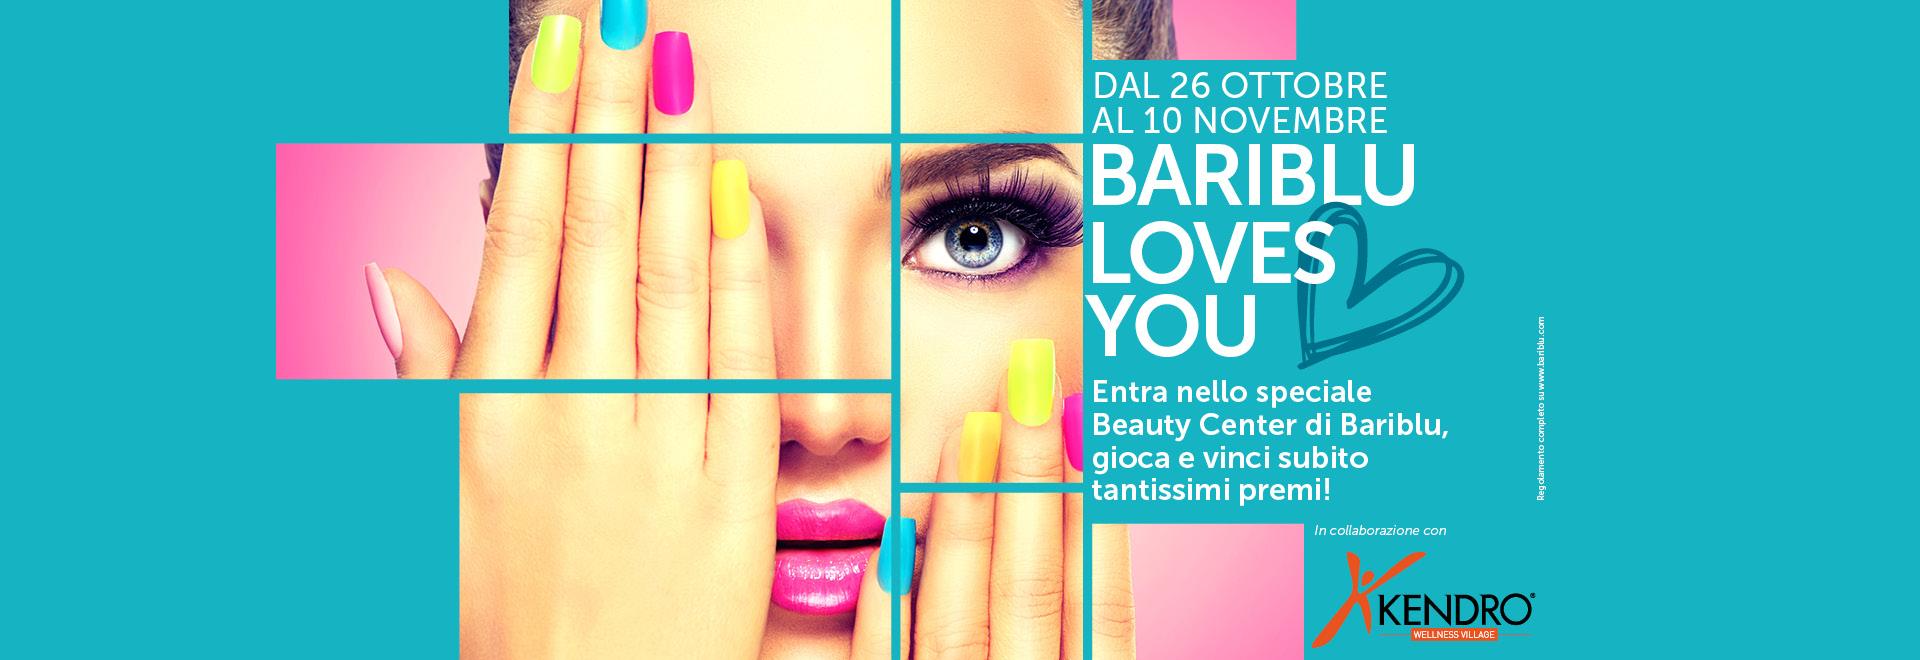 BariBlu Loves You